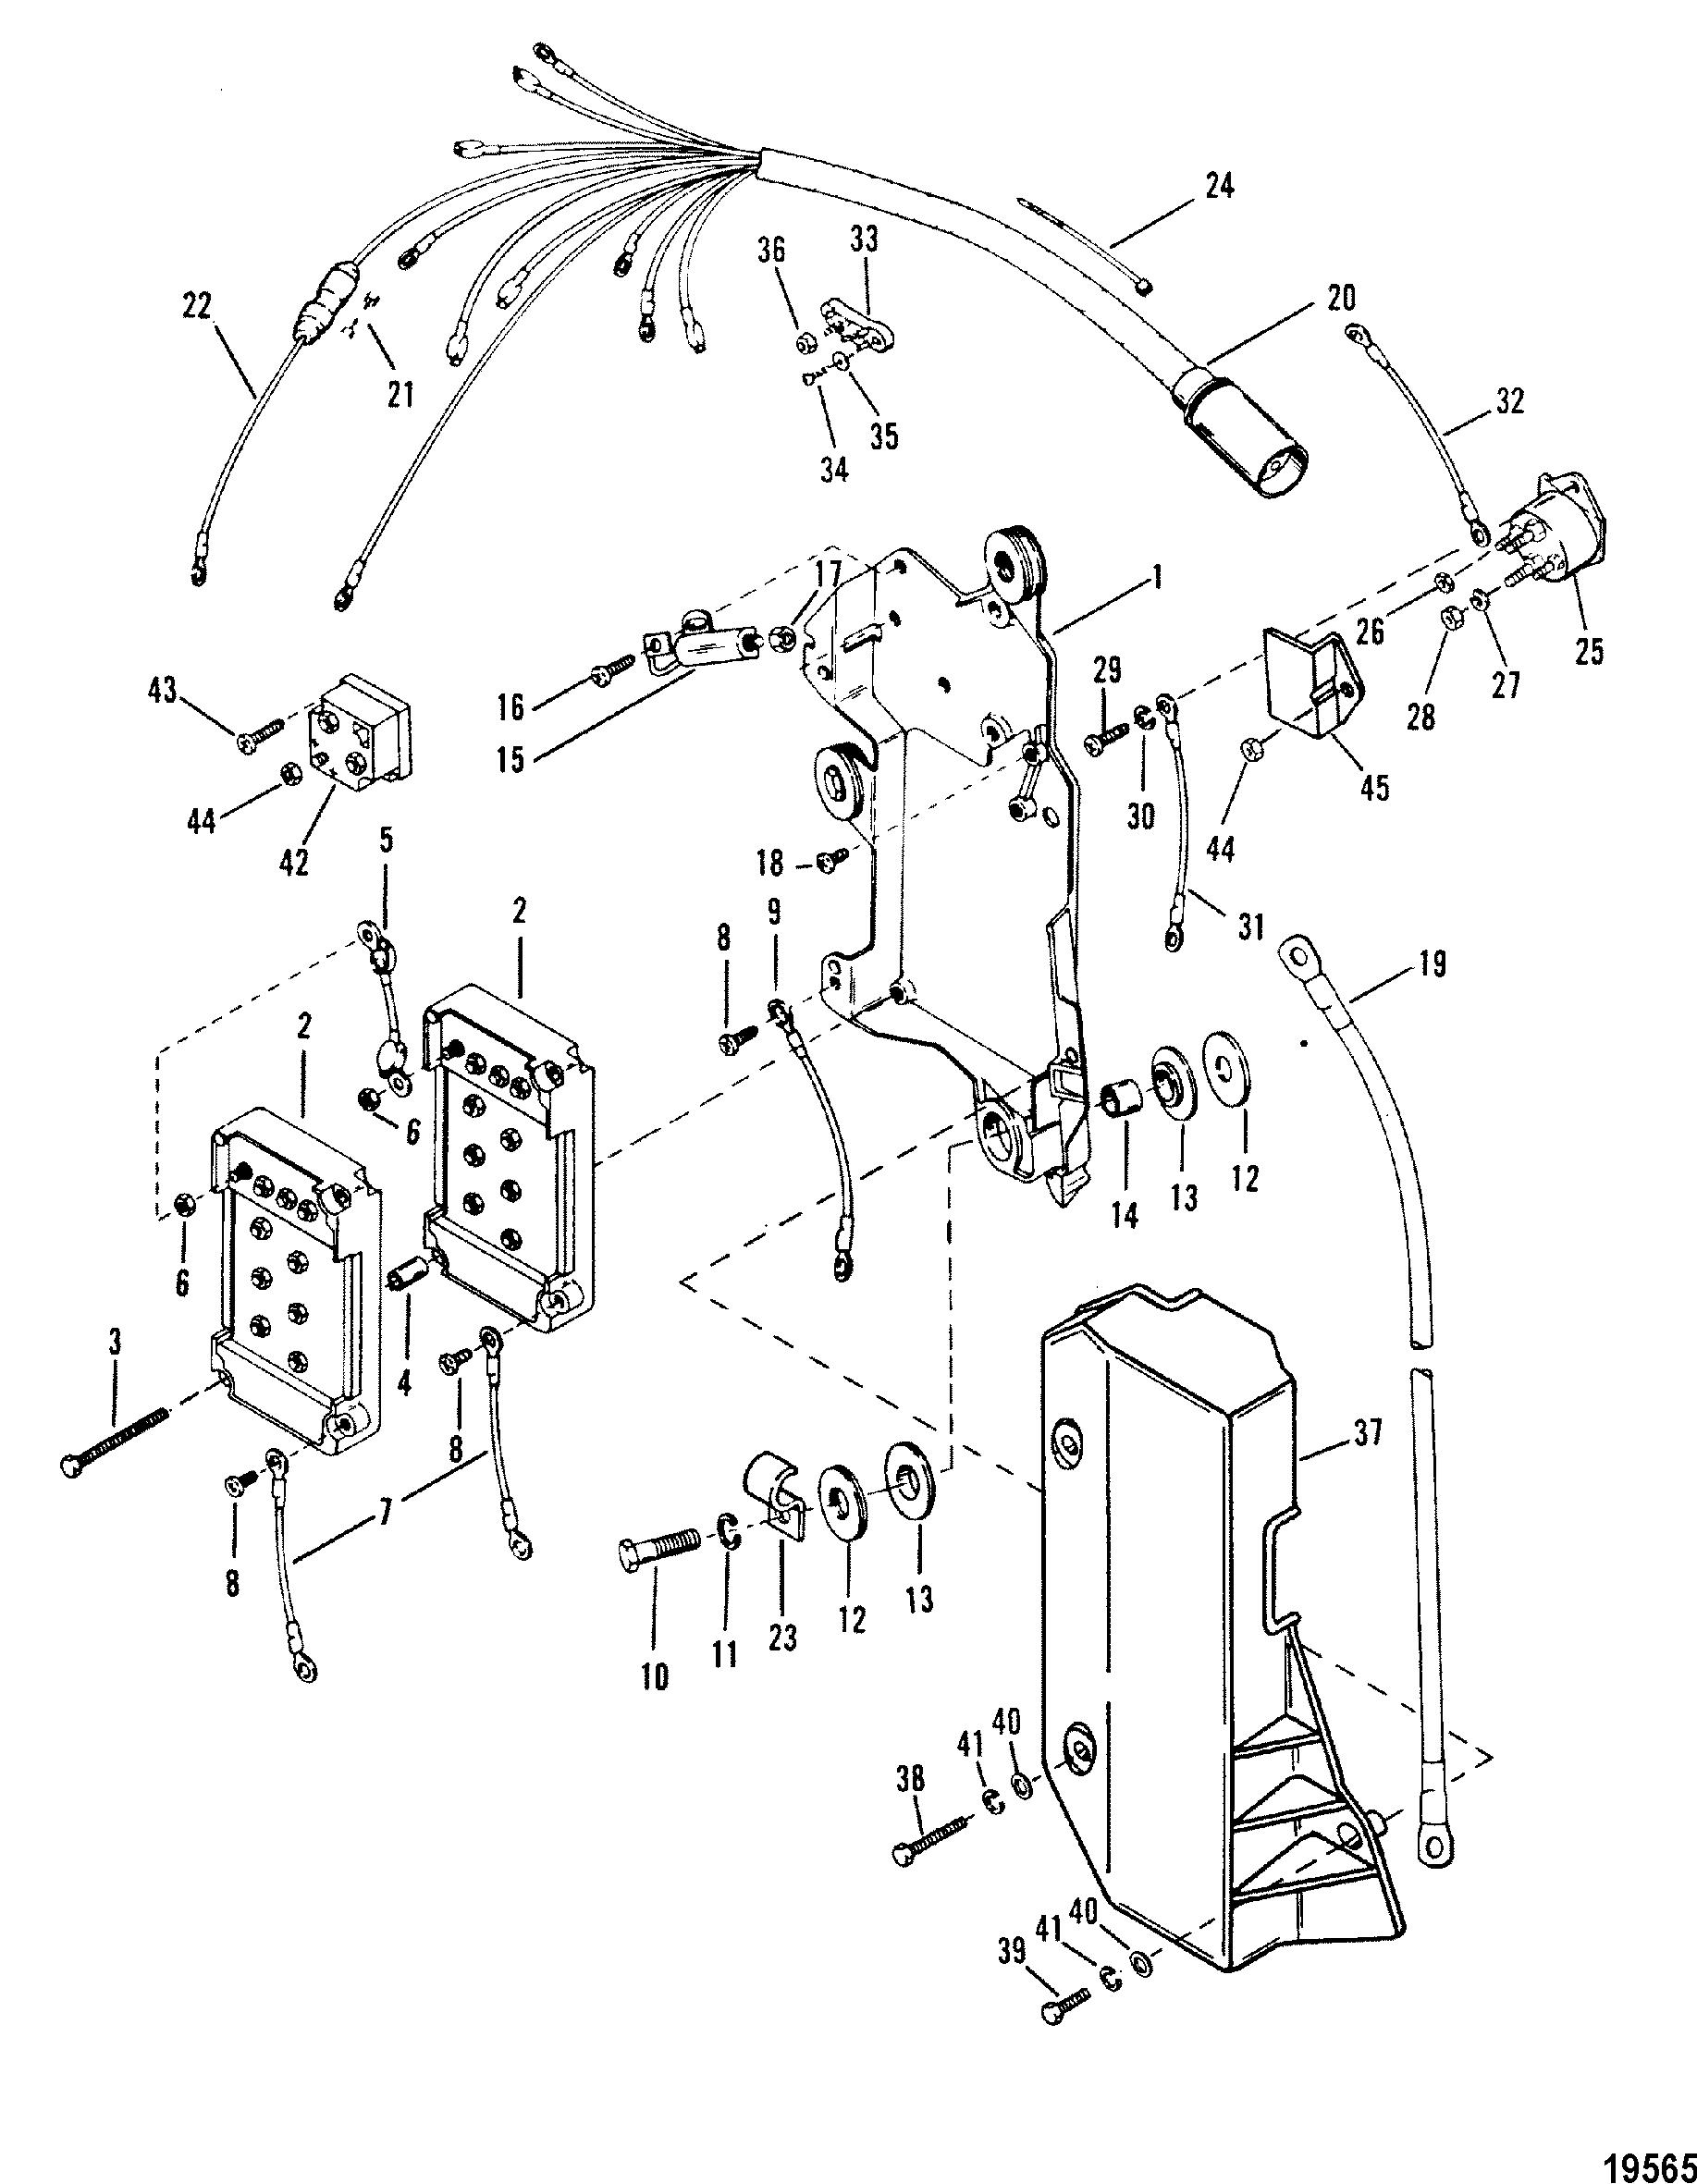 XC_2835] Mariner Magnum 40 Hp Wiring Diagram Wiring DiagramBdel Joni Hete Dome Mohammedshrine Librar Wiring 101